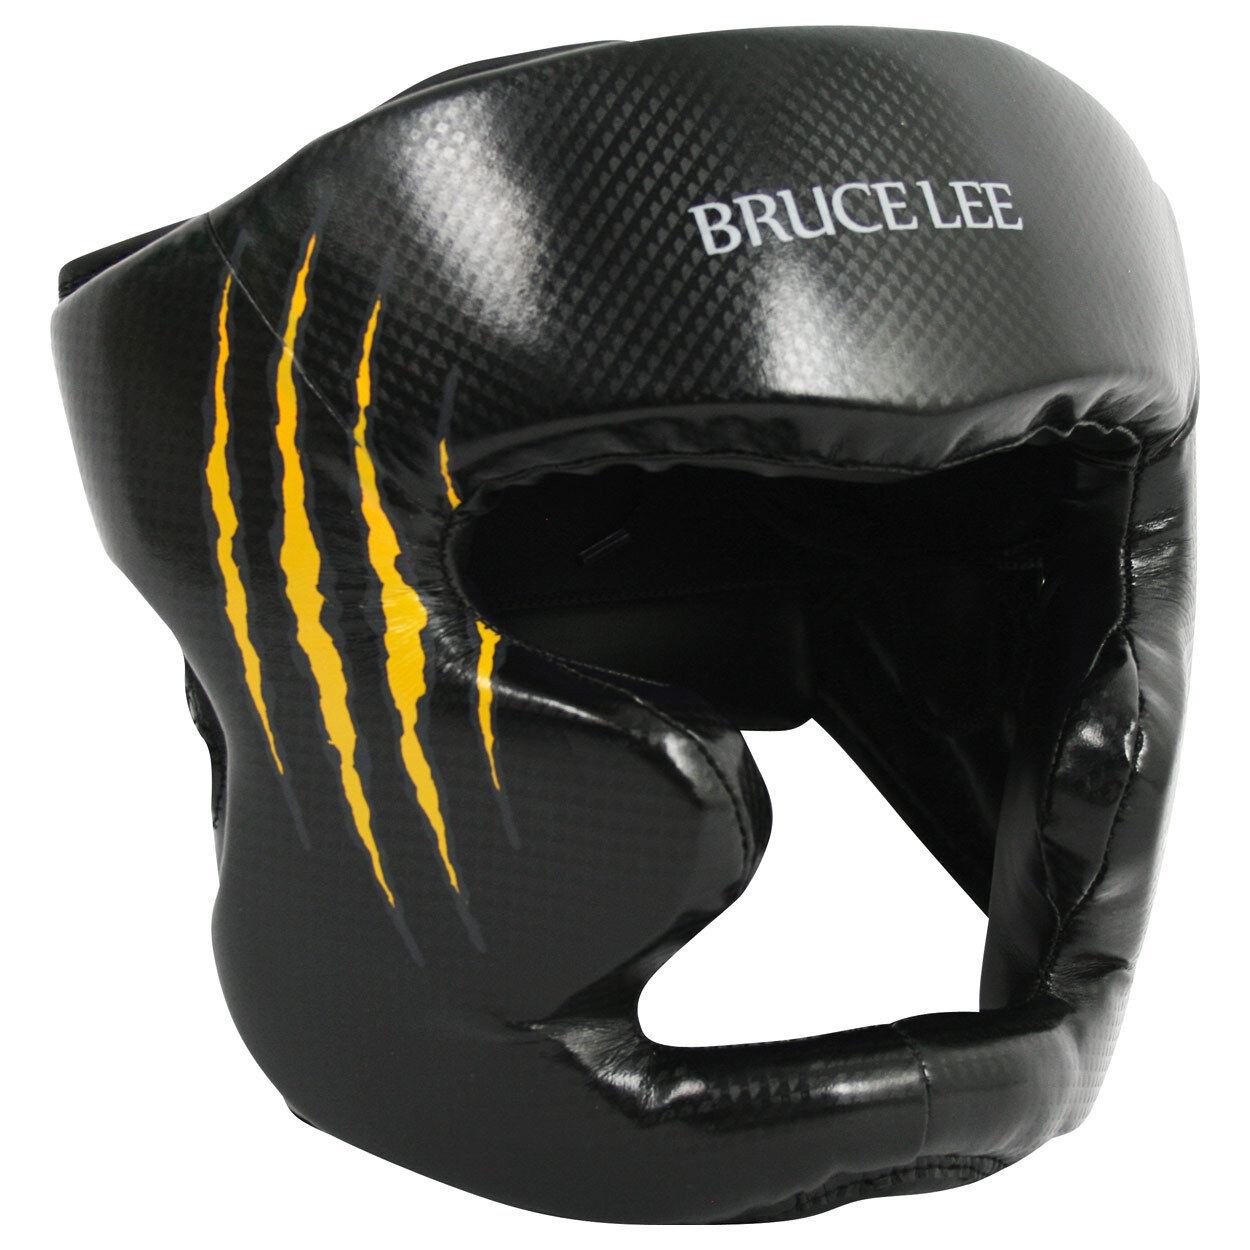 Bruce Bruce Bruce Lee Kopfschutz, Gr. L-XL fc1153